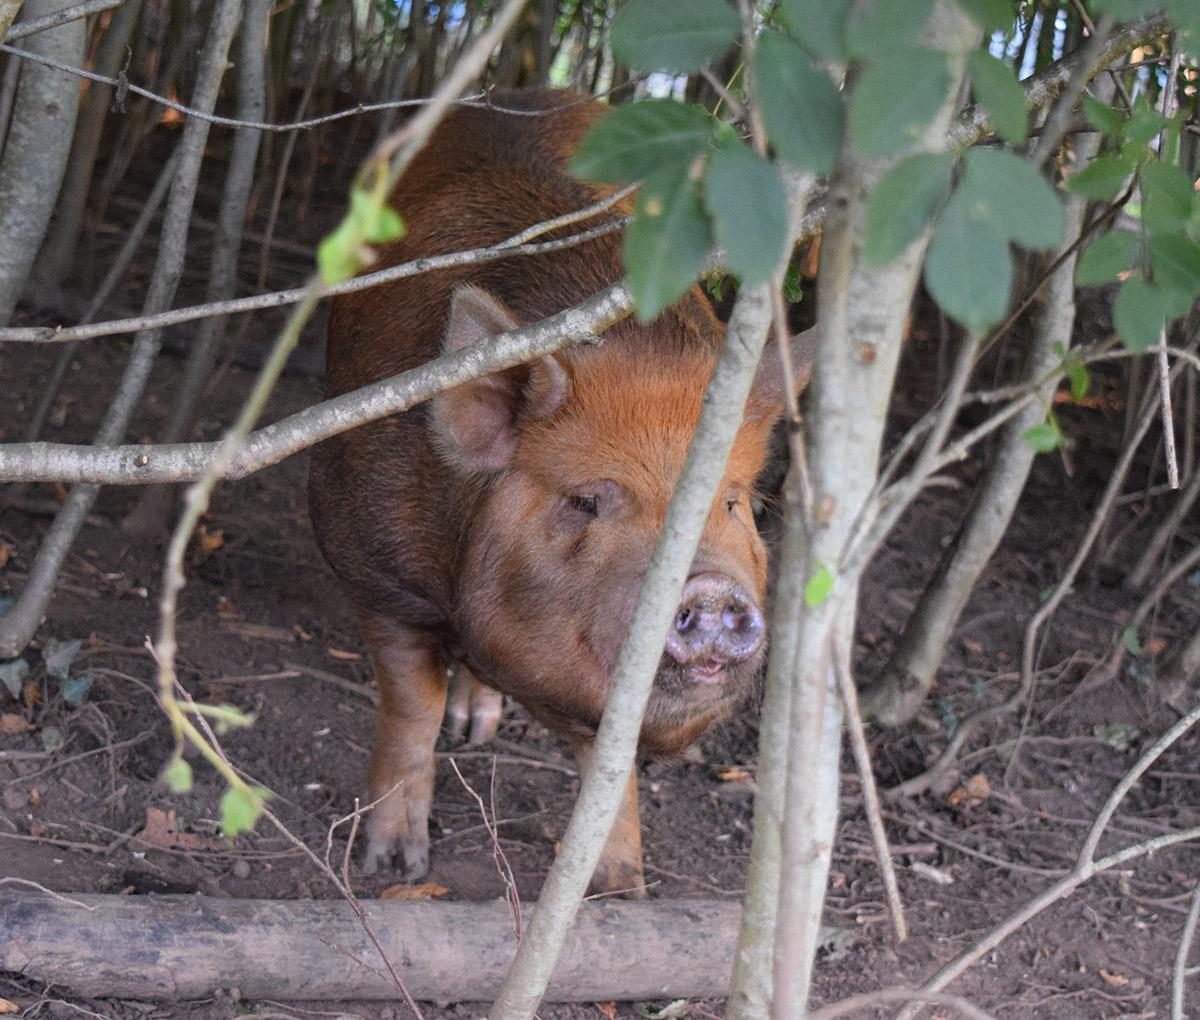 Pig Hiding